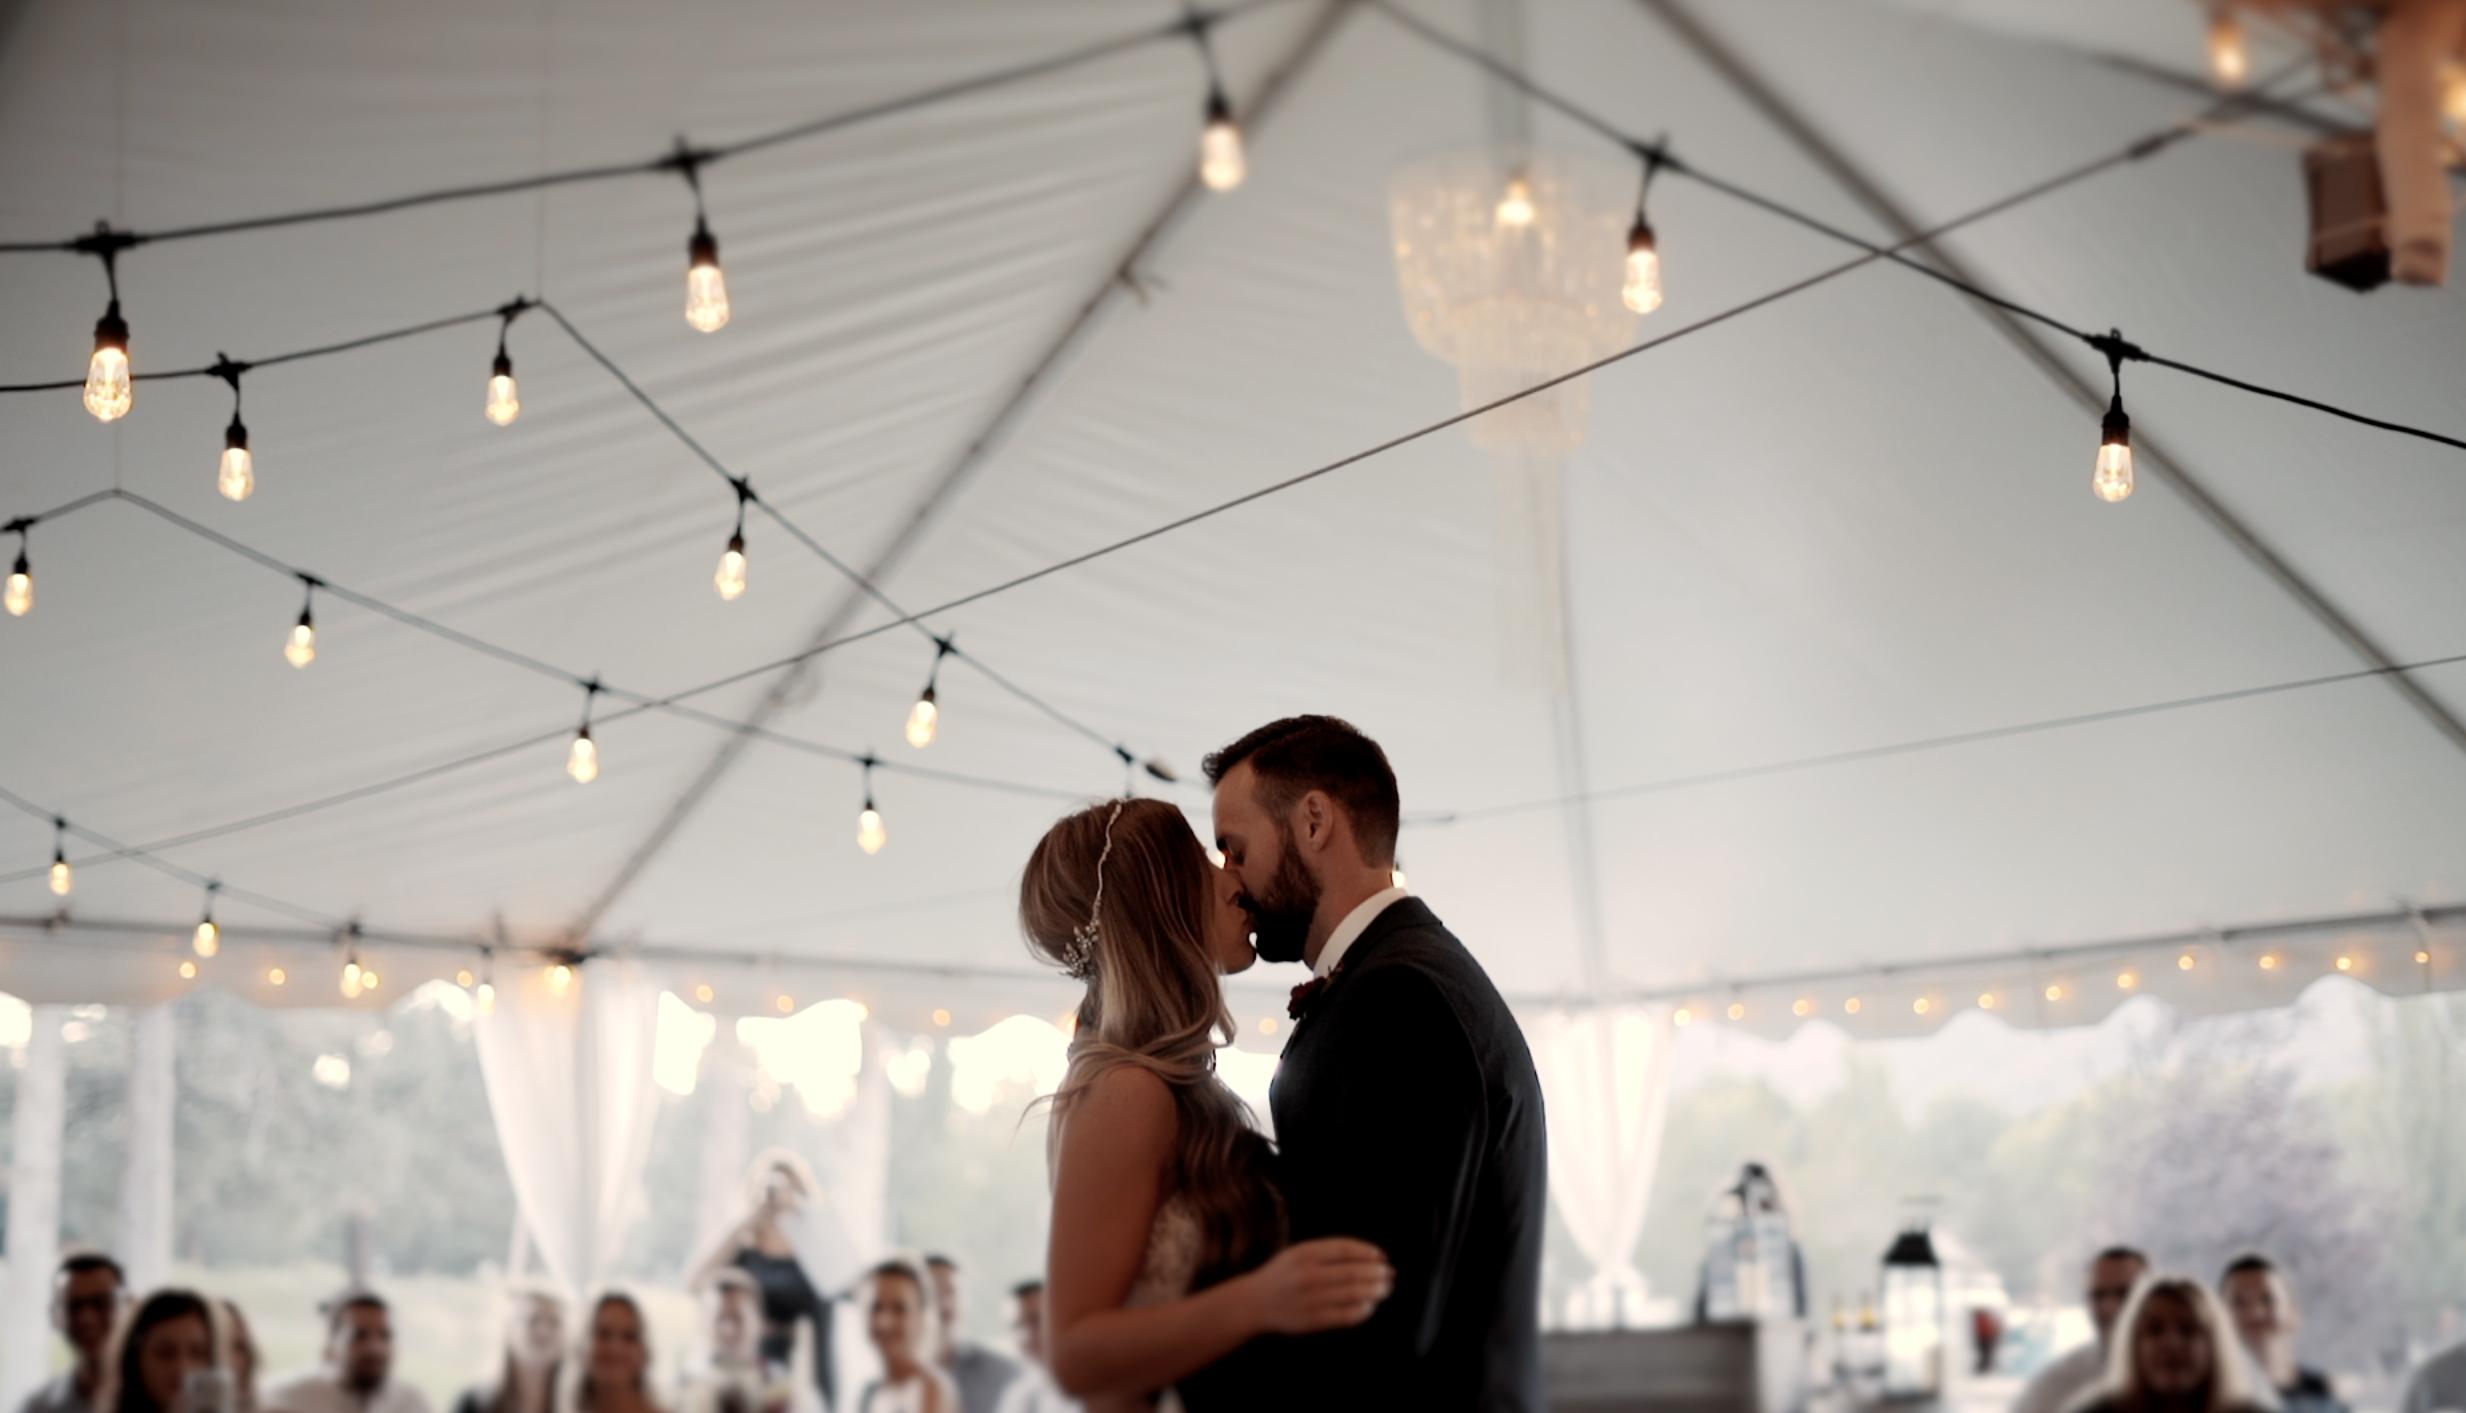 Kevin & Lauren - The perfect Northern Arizona wedding video filmed in Flagstaff, AZ.